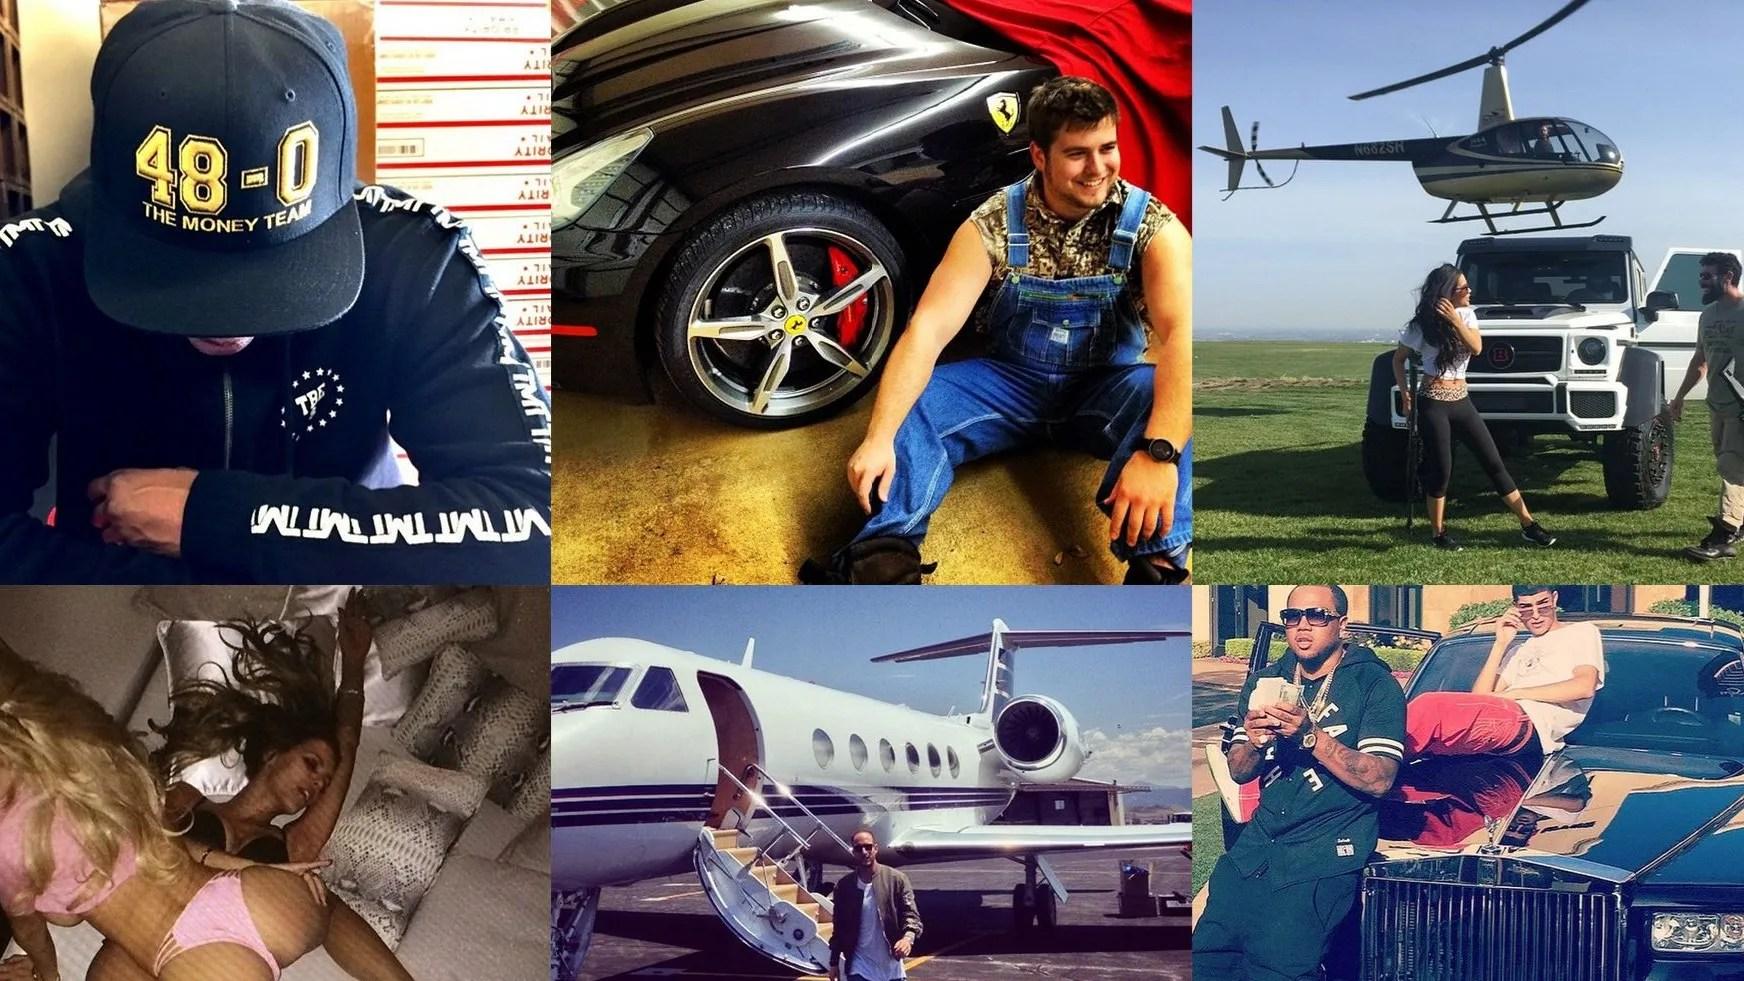 Car Money Watch Wallpaper These Are The Richest Men Of Instagram British Gq